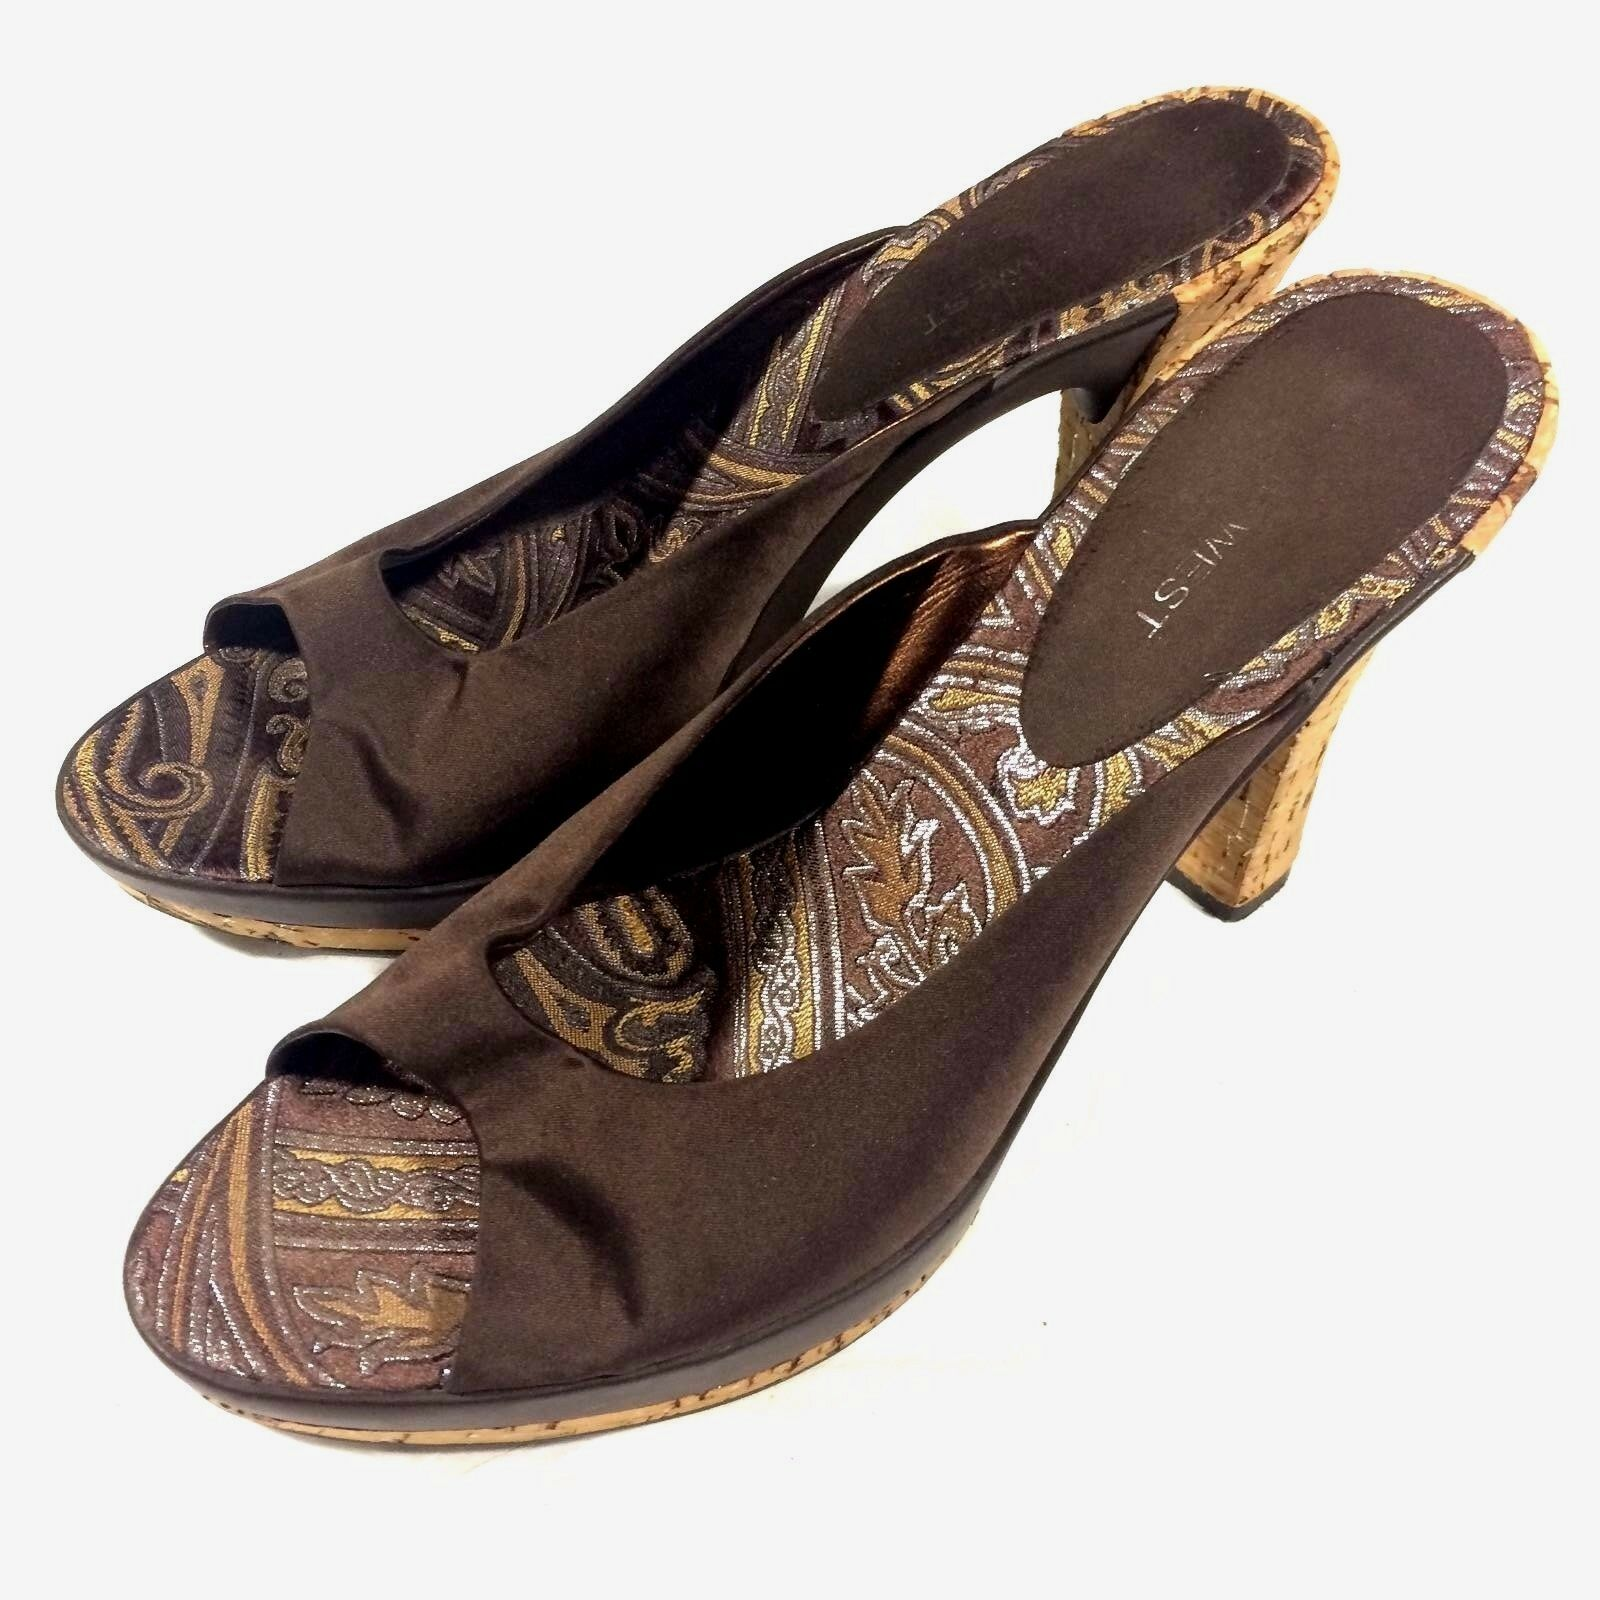 Nine Women West Sandals Women Nine Size 9 Cork Heels 1df697